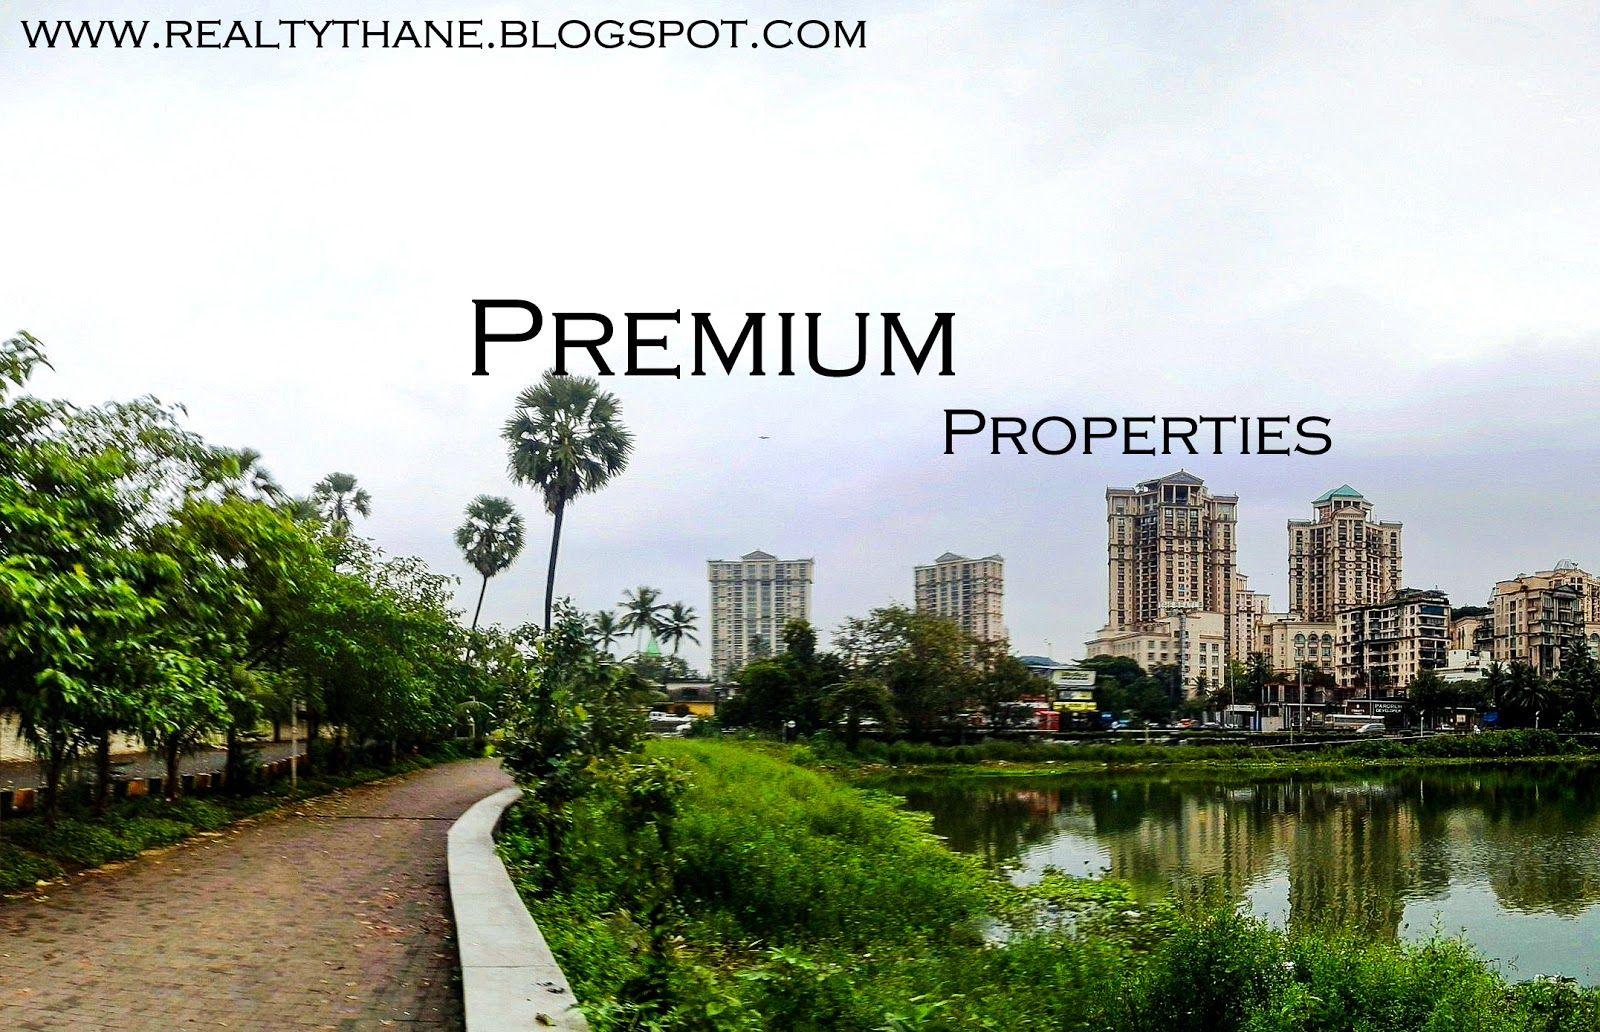 5b63c1252ceebd677b08b0ab49733dfa - Service Apartments In Hiranandani Gardens Powai